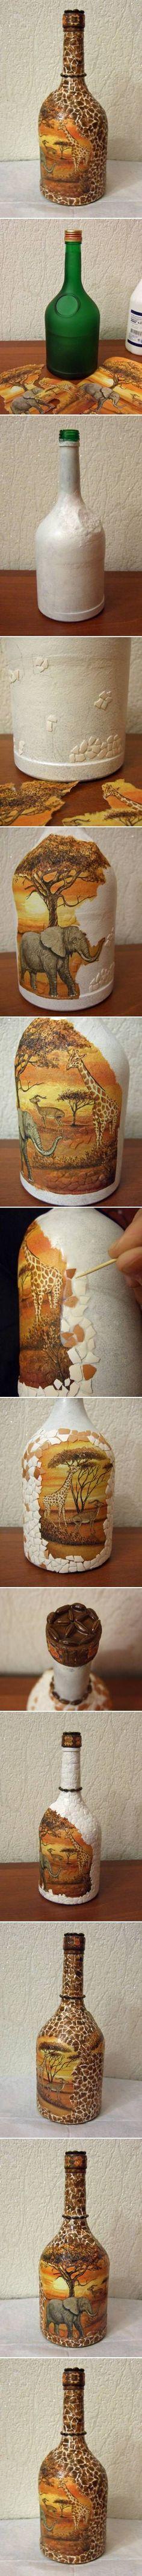 DIY African Motif Bottle